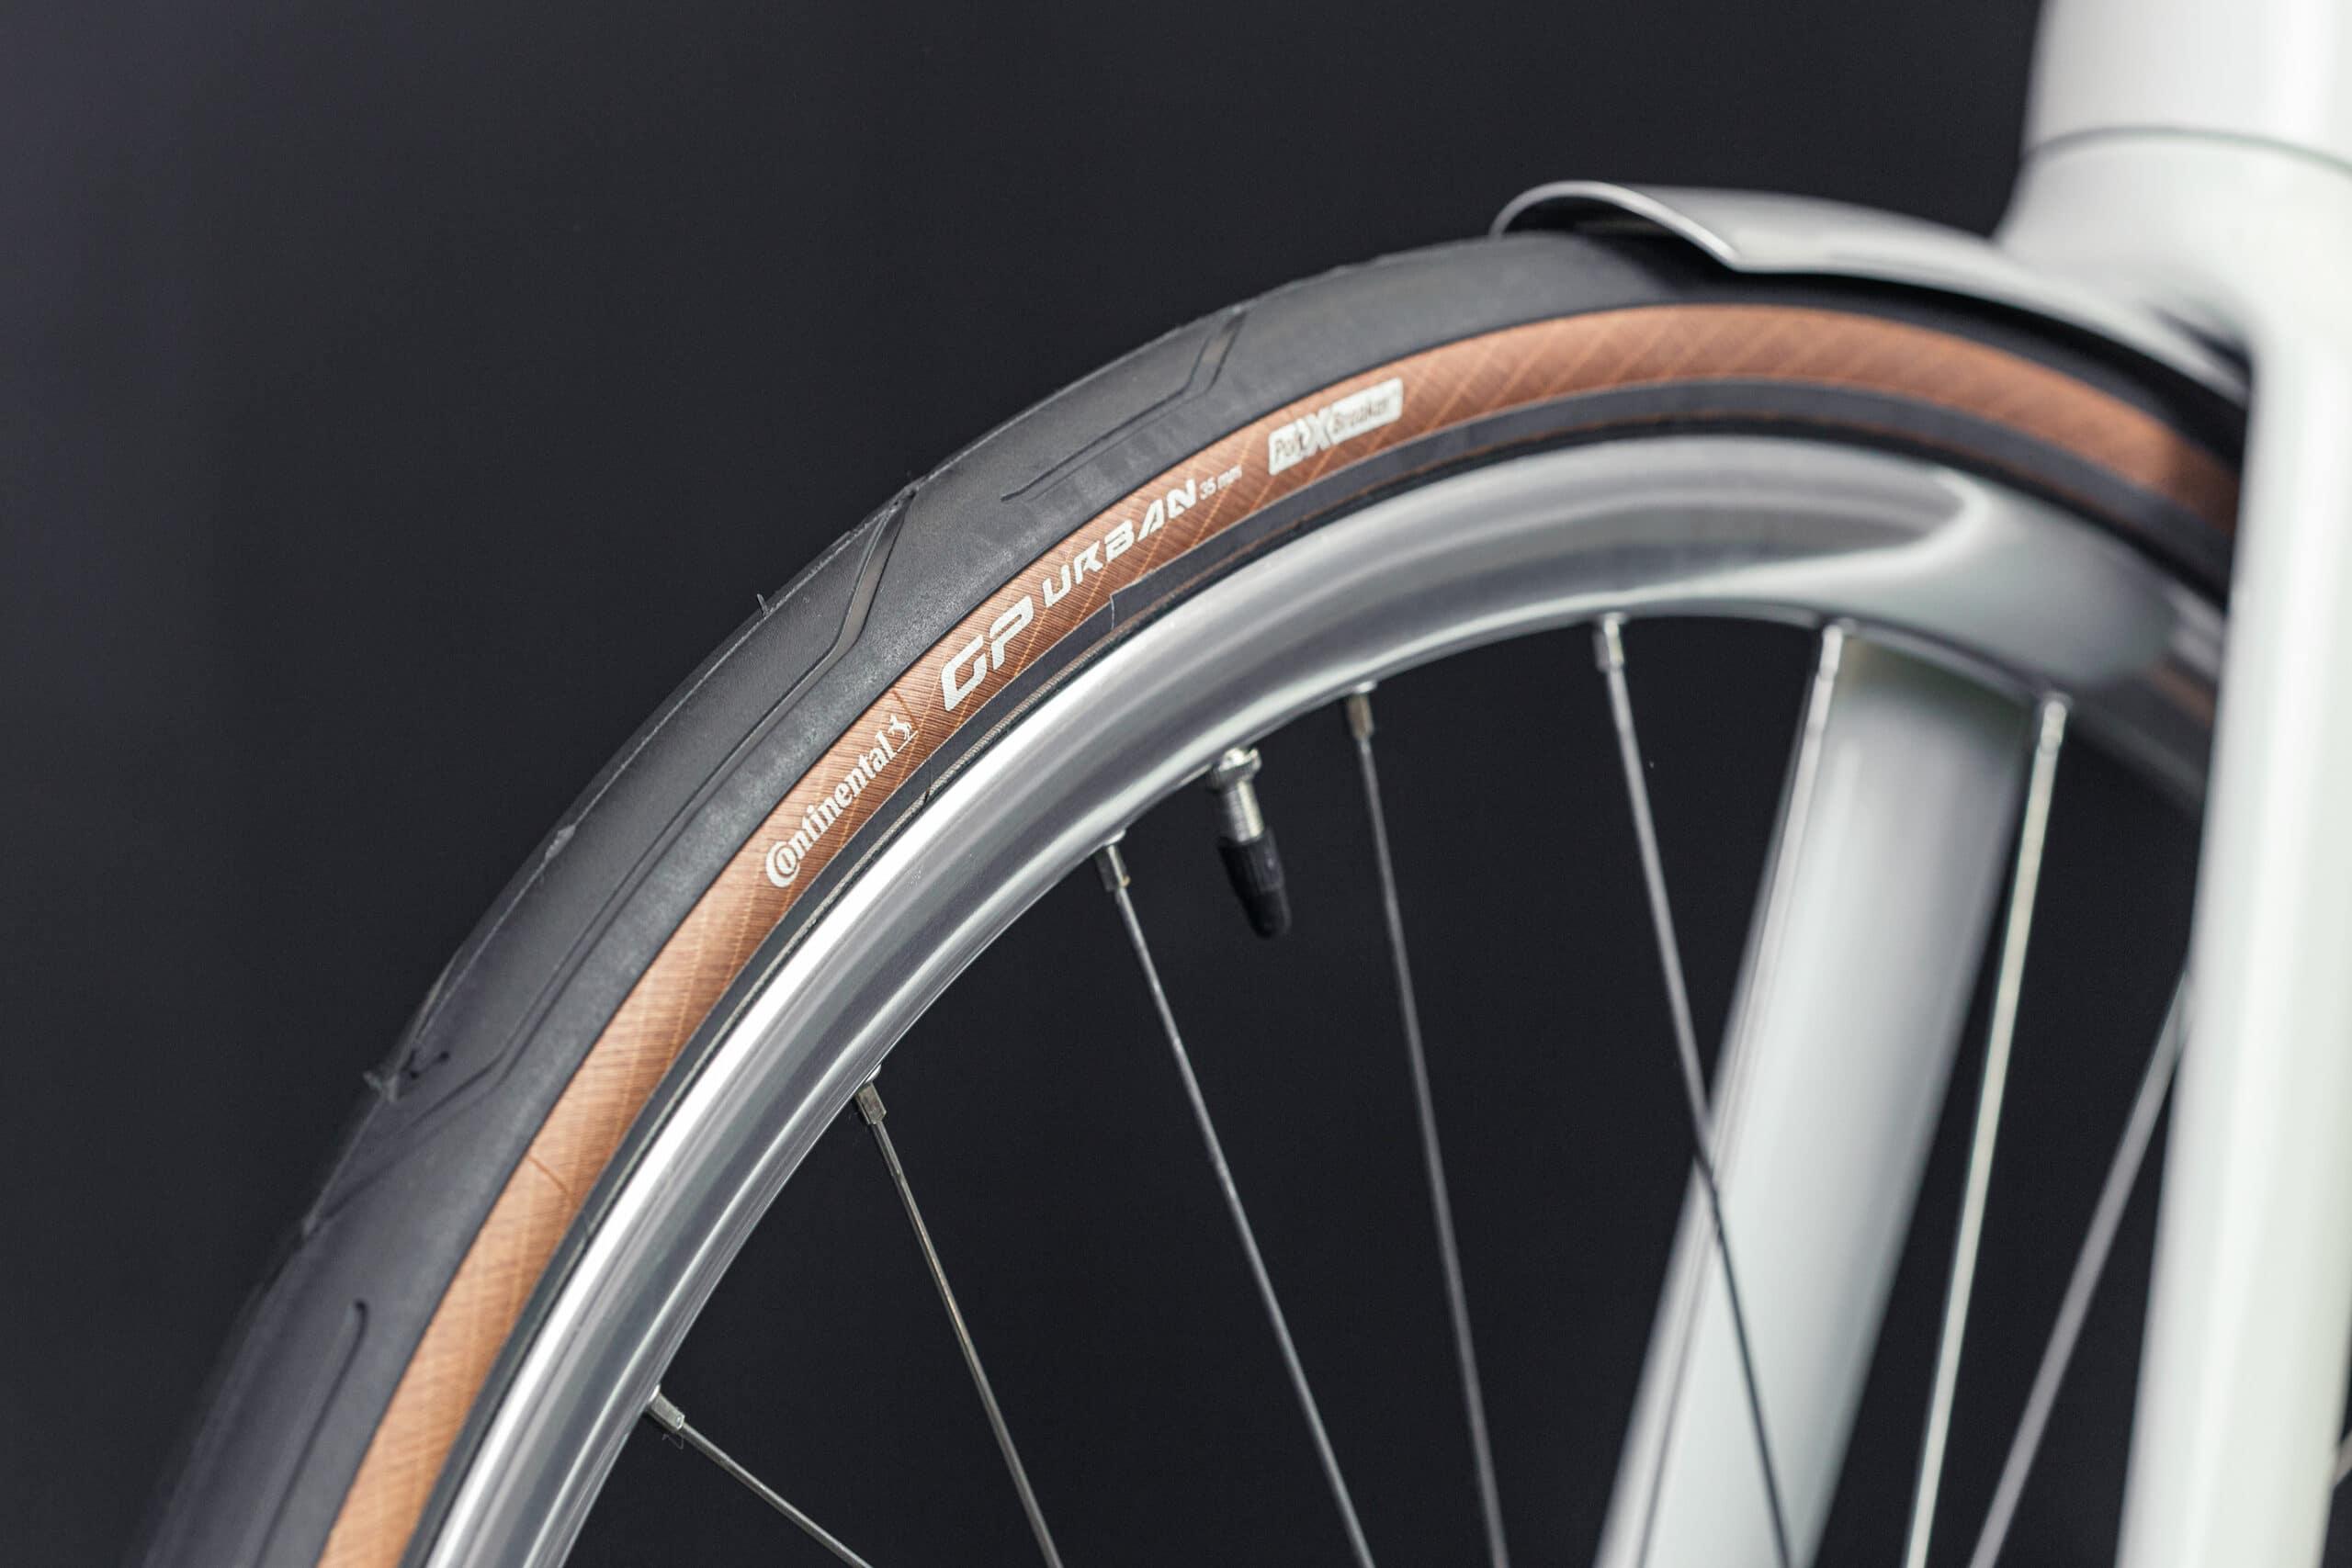 schindelhauer Antonia Pinion e-bike -14